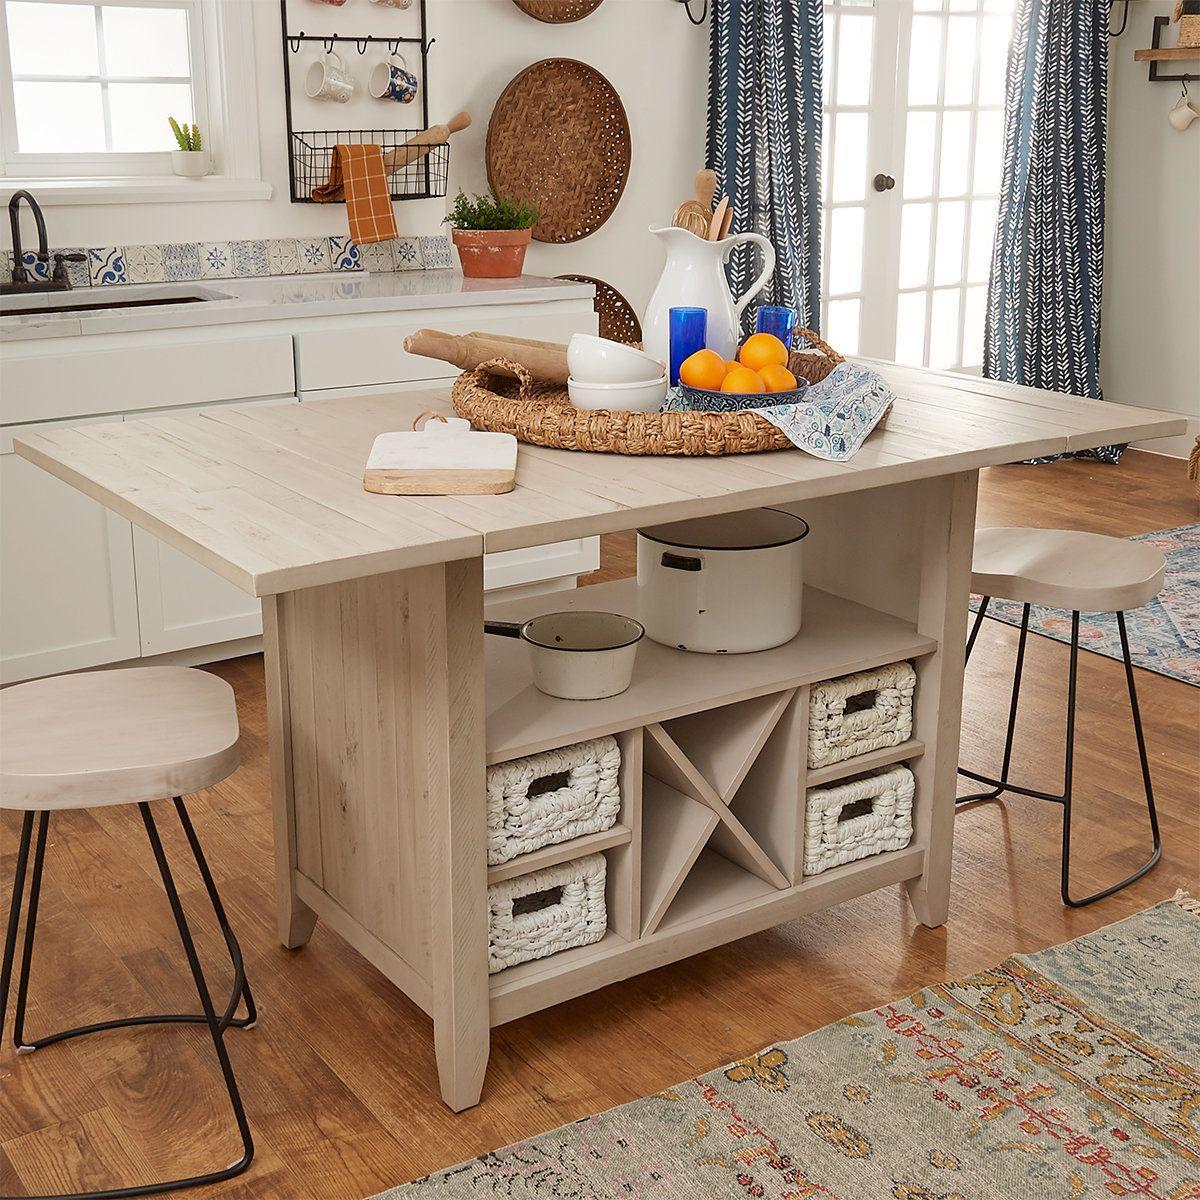 Crosley Drop Leaf Kitchen Island Kitchen Island Furniture Kitchen Island Dining Table Kitchen Island Plans